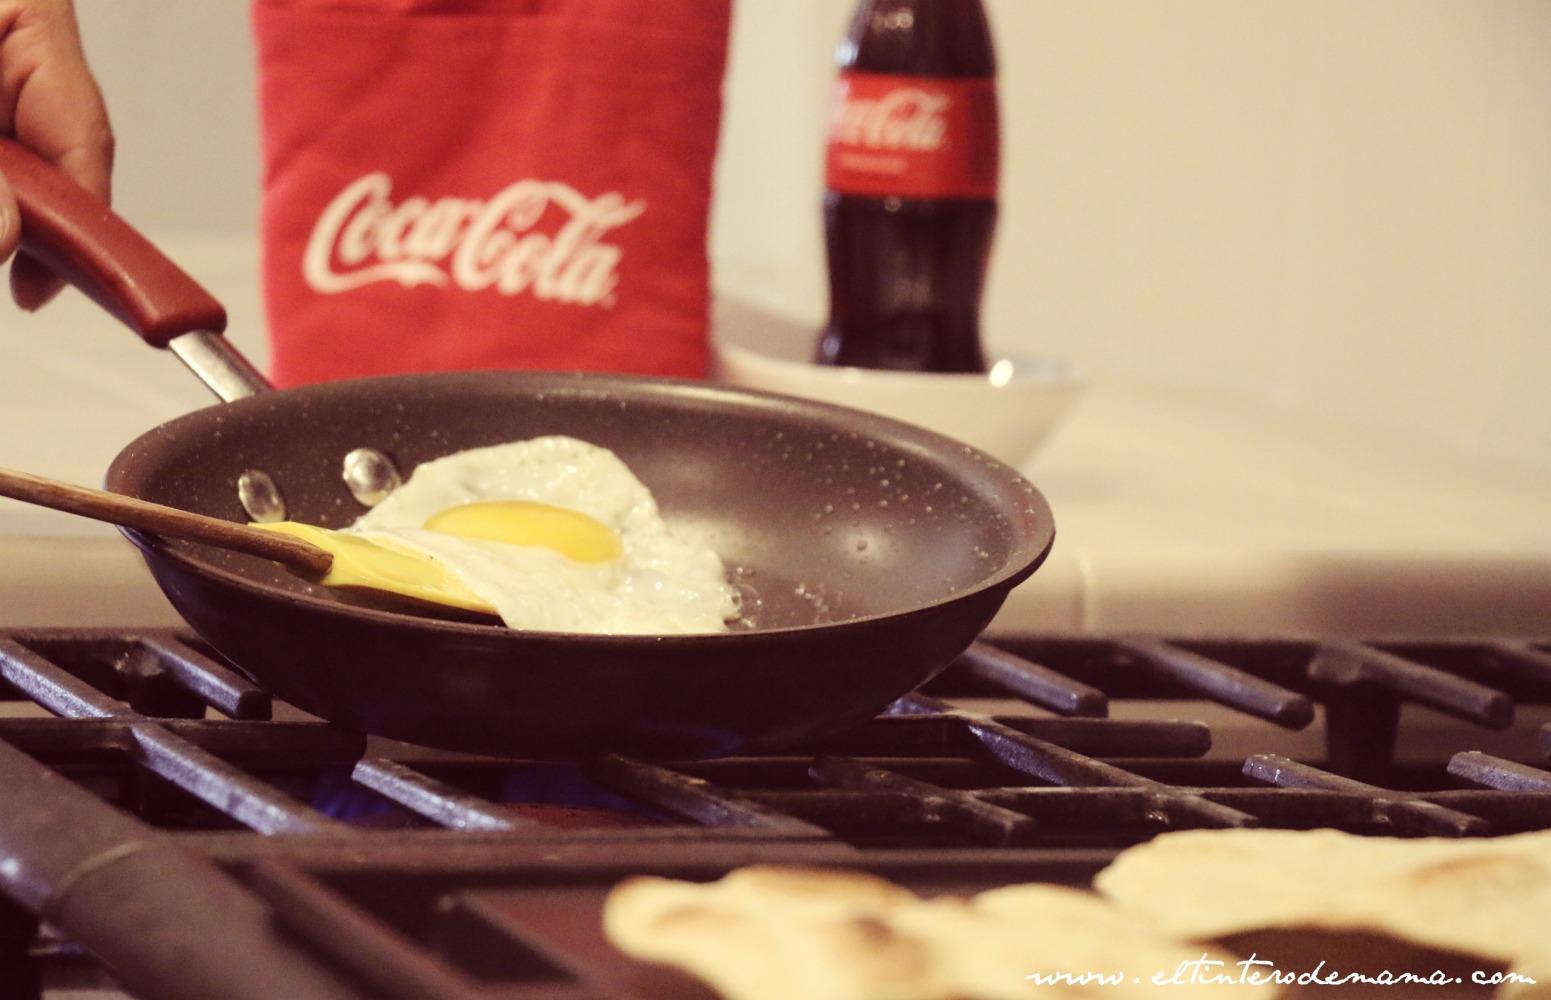 Celebrate-Hispanic-Heritage-Month-with-Coca-Cola